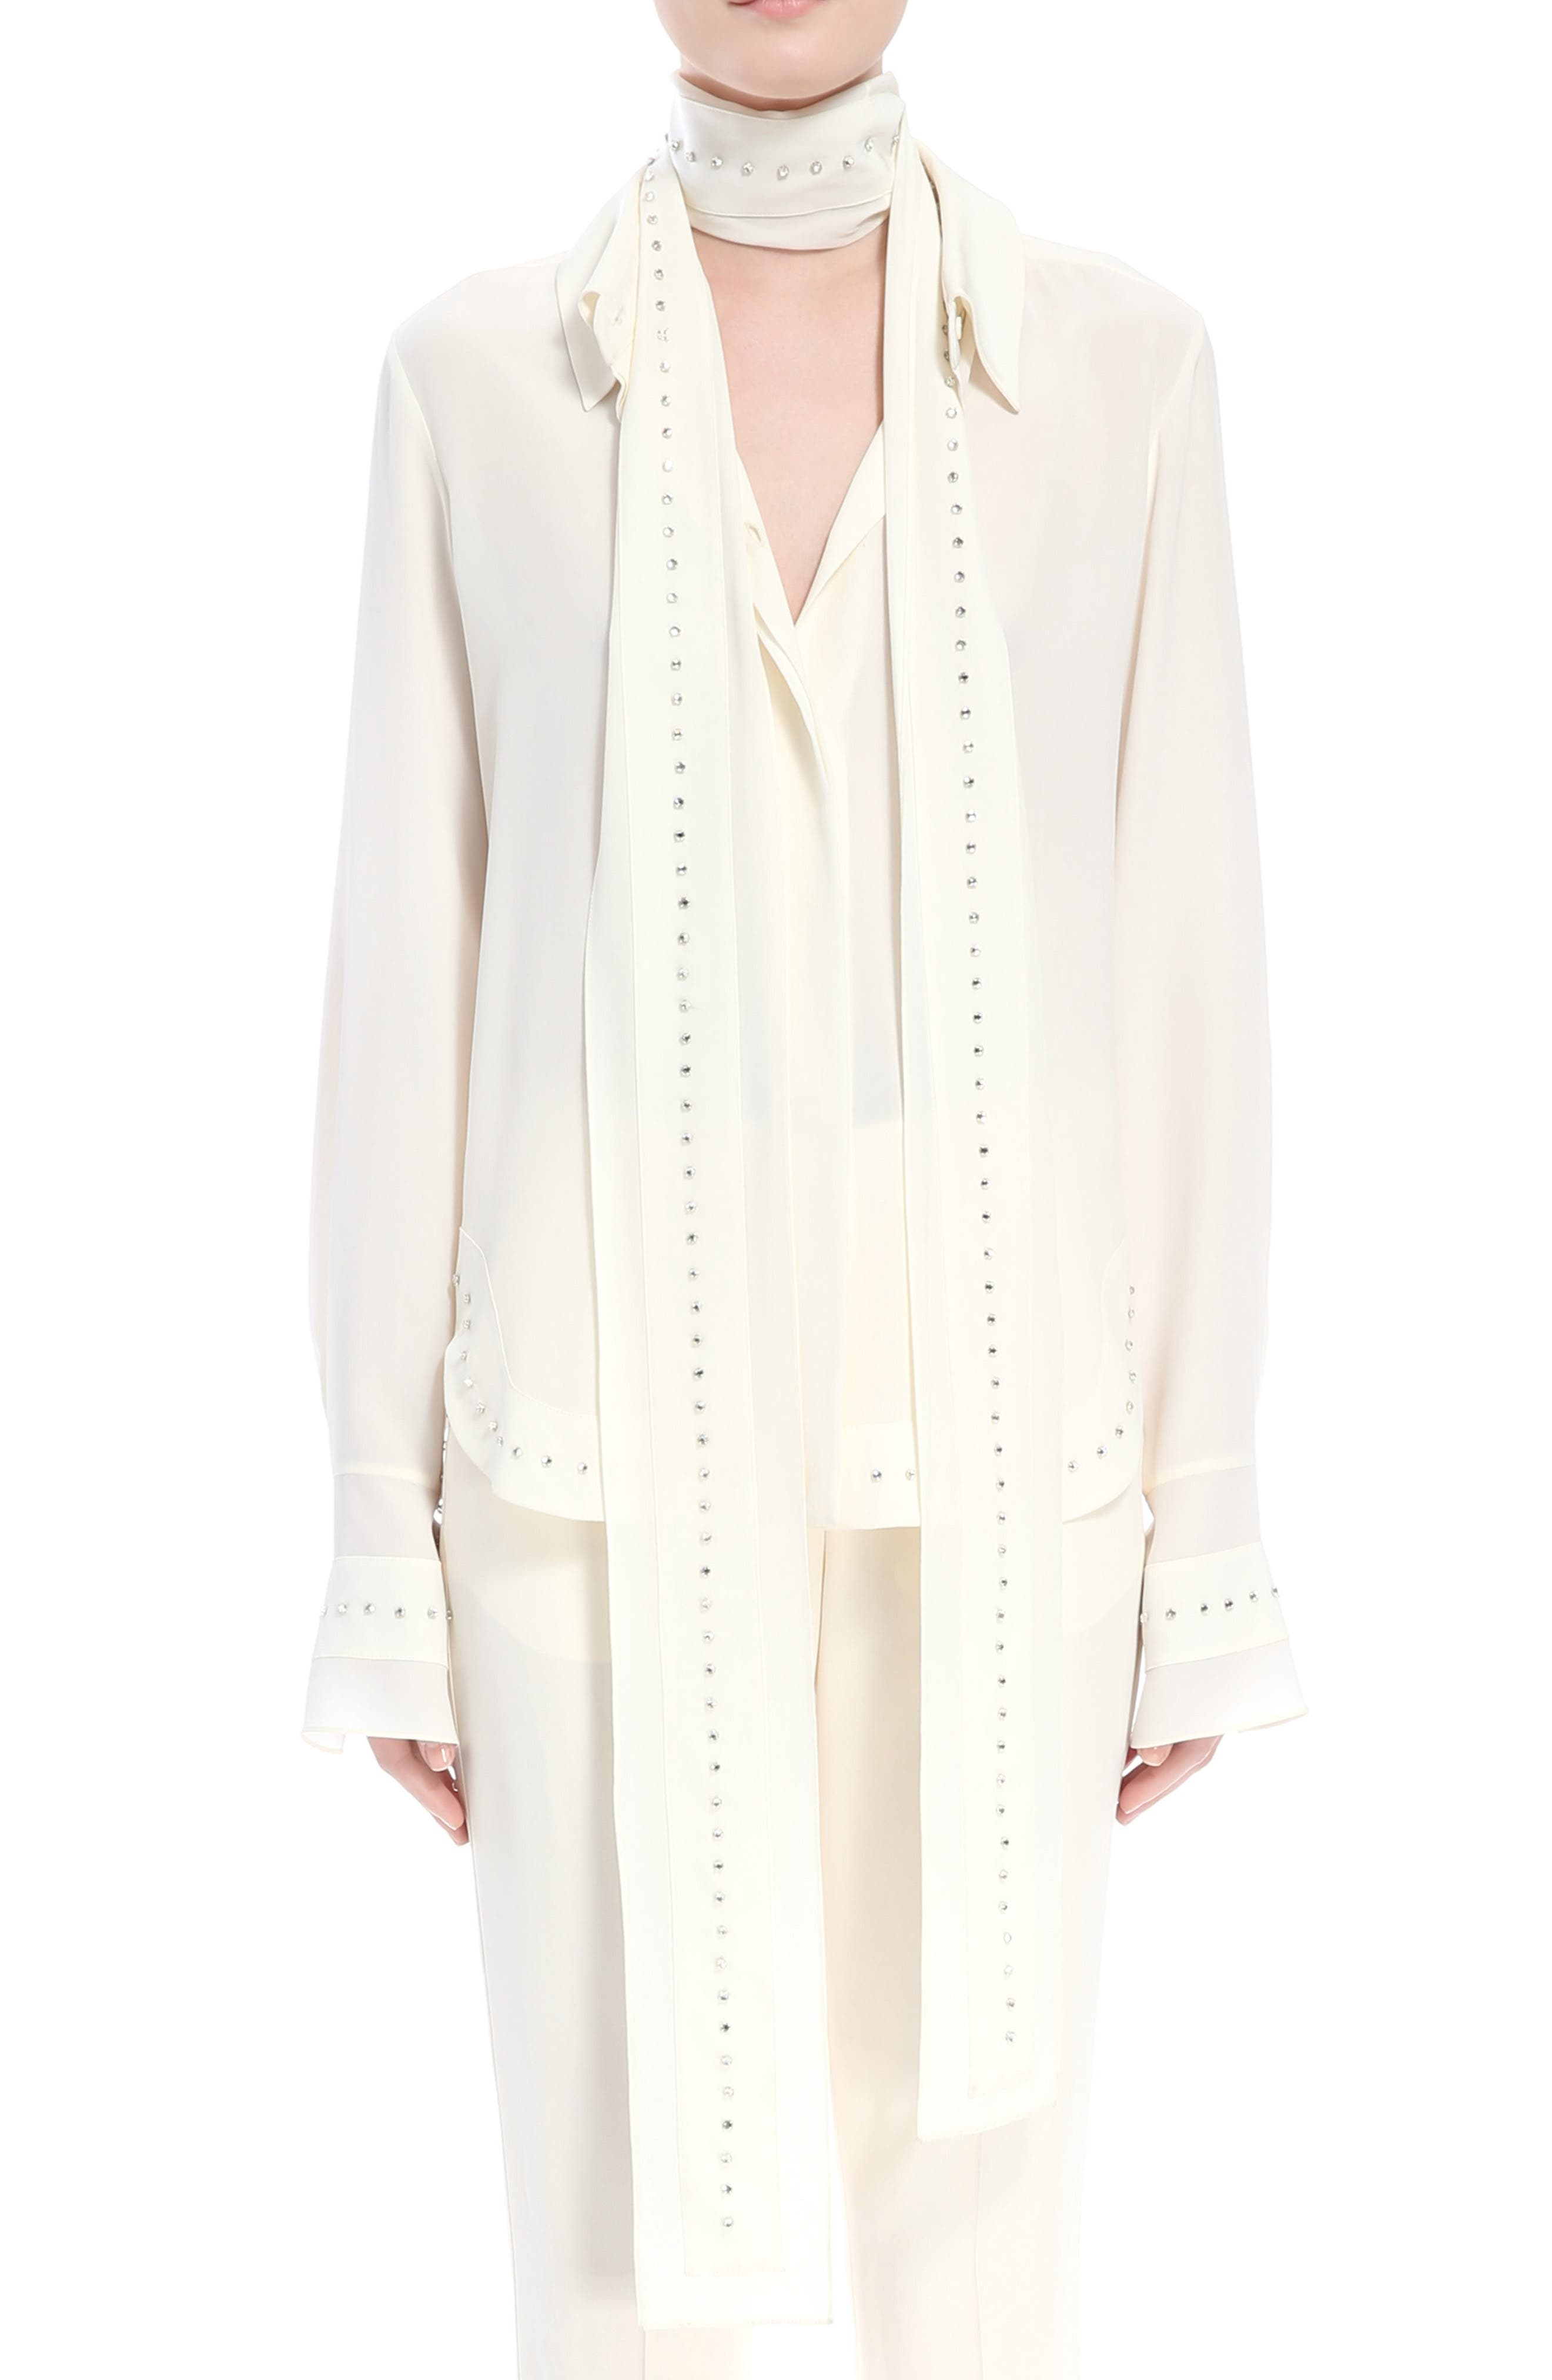 Alternate Image 1 Selected - Chloé Rhinstone Trim Silk Shirt with Scarf